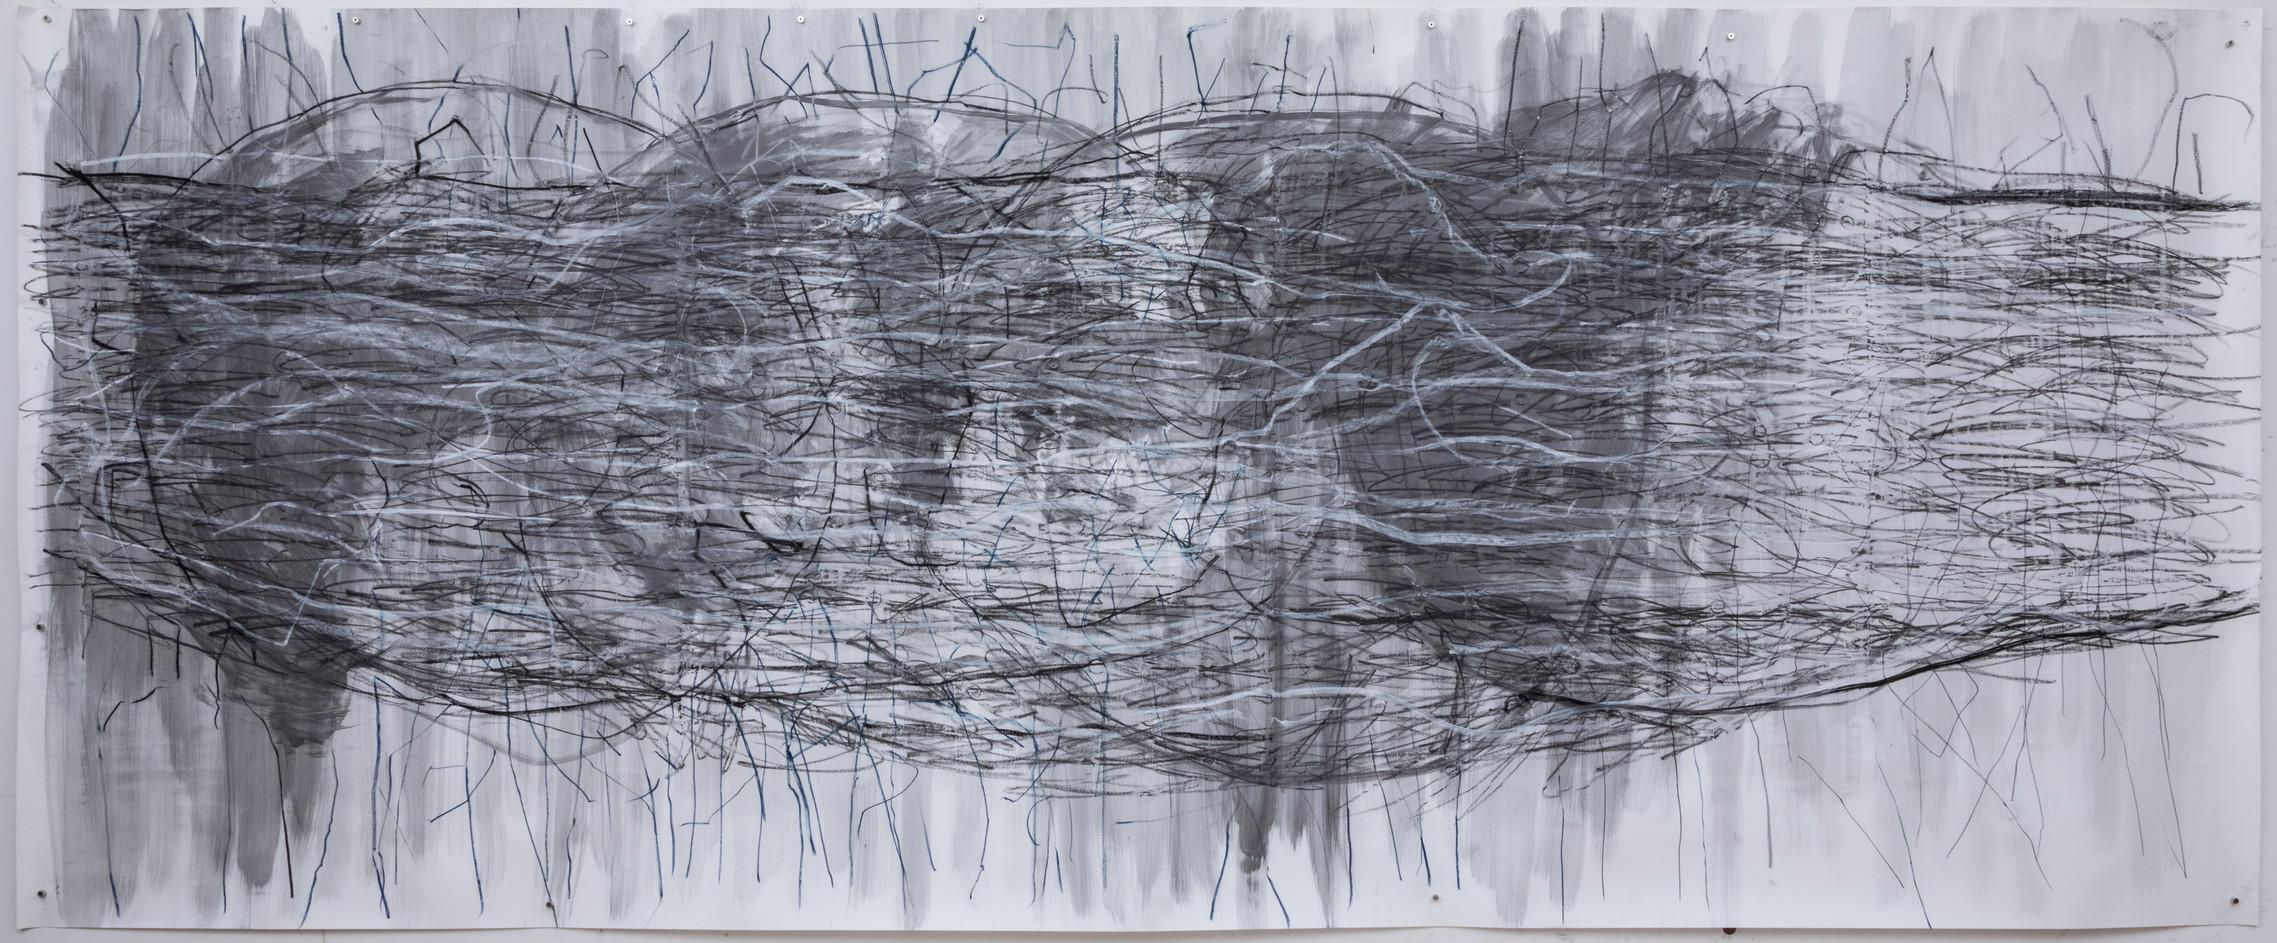 154 x 273 cm grafite e giz pastel oleoso sobre papel foto: Ruy Teixeira